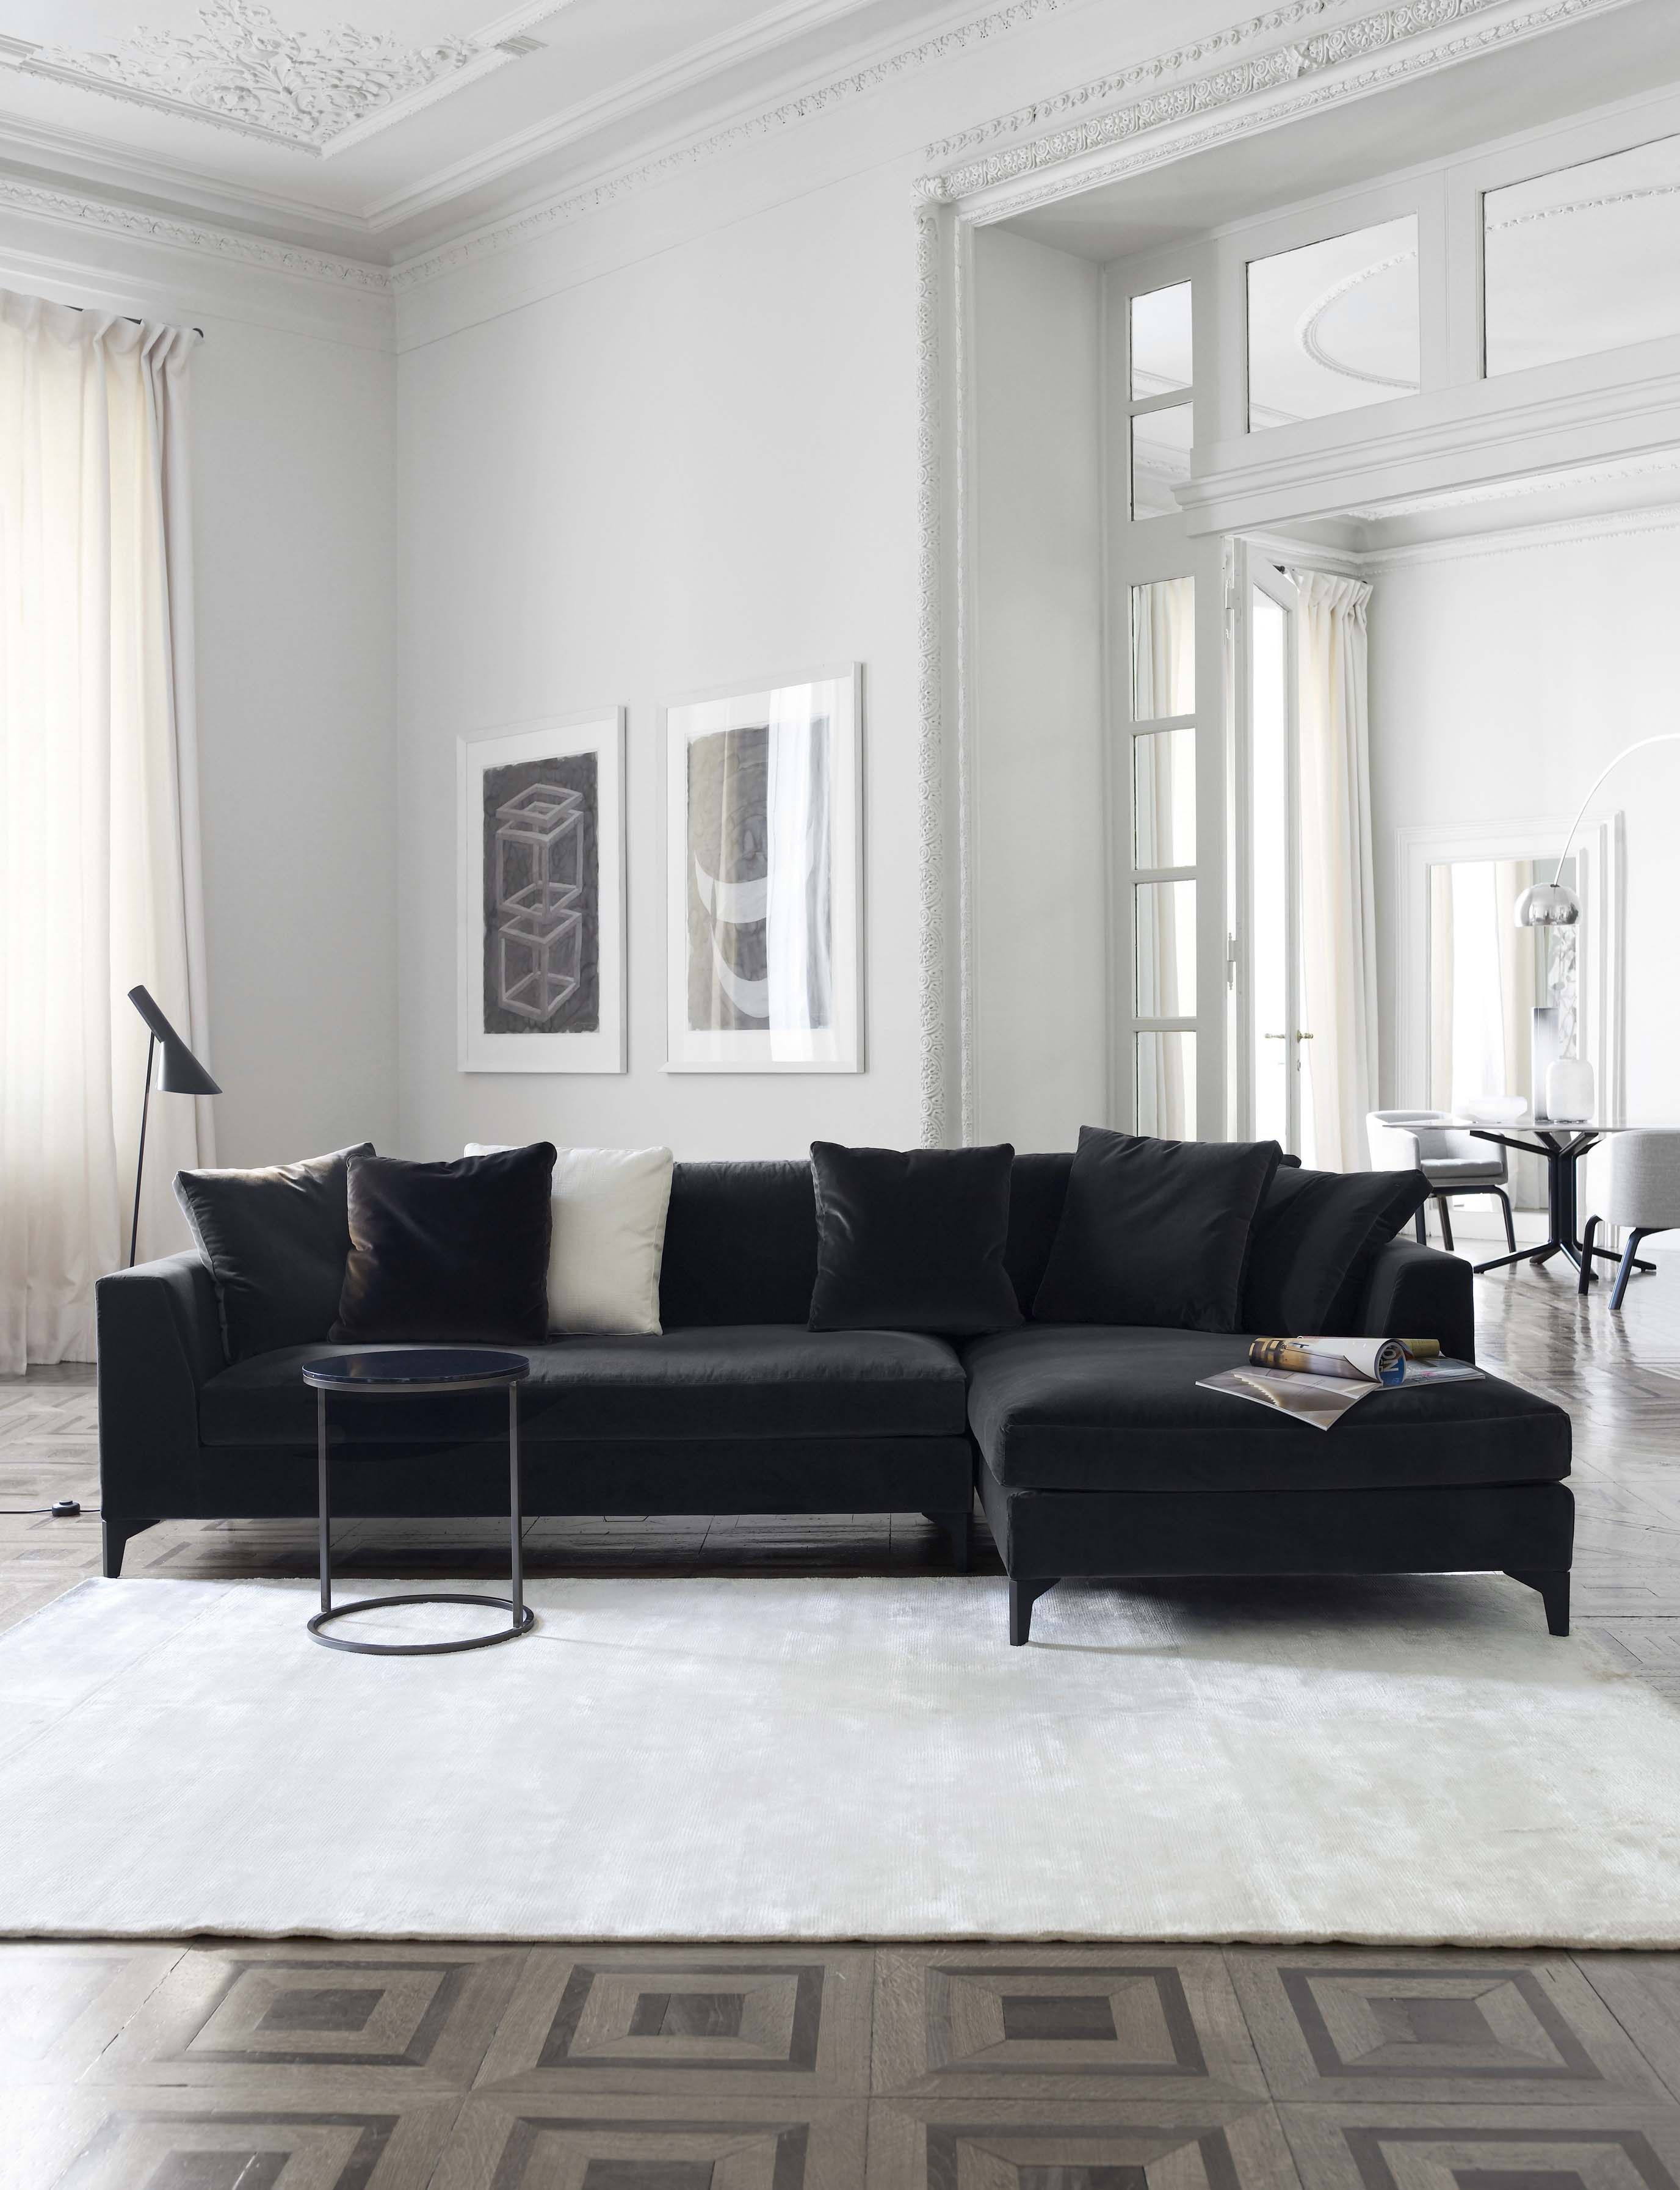 Meridiani I Lewis Up Modular Sofa I Peck Low Table I Lalit Rug Decoration Salon Sejour Canape Design Deco Maison